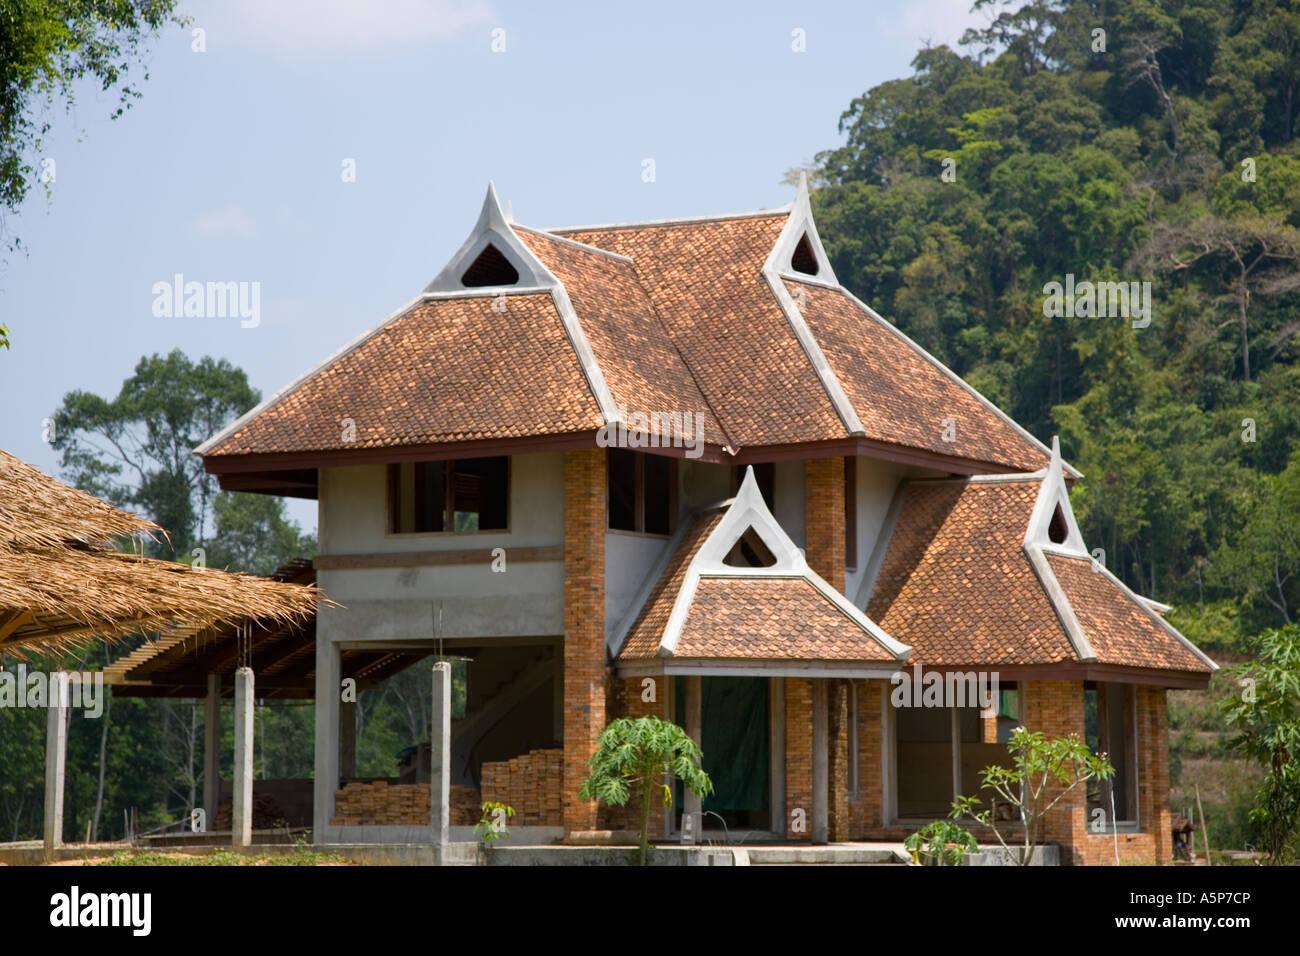 Thailand houses modern housing krabi province thailand for Thailand houses pictures